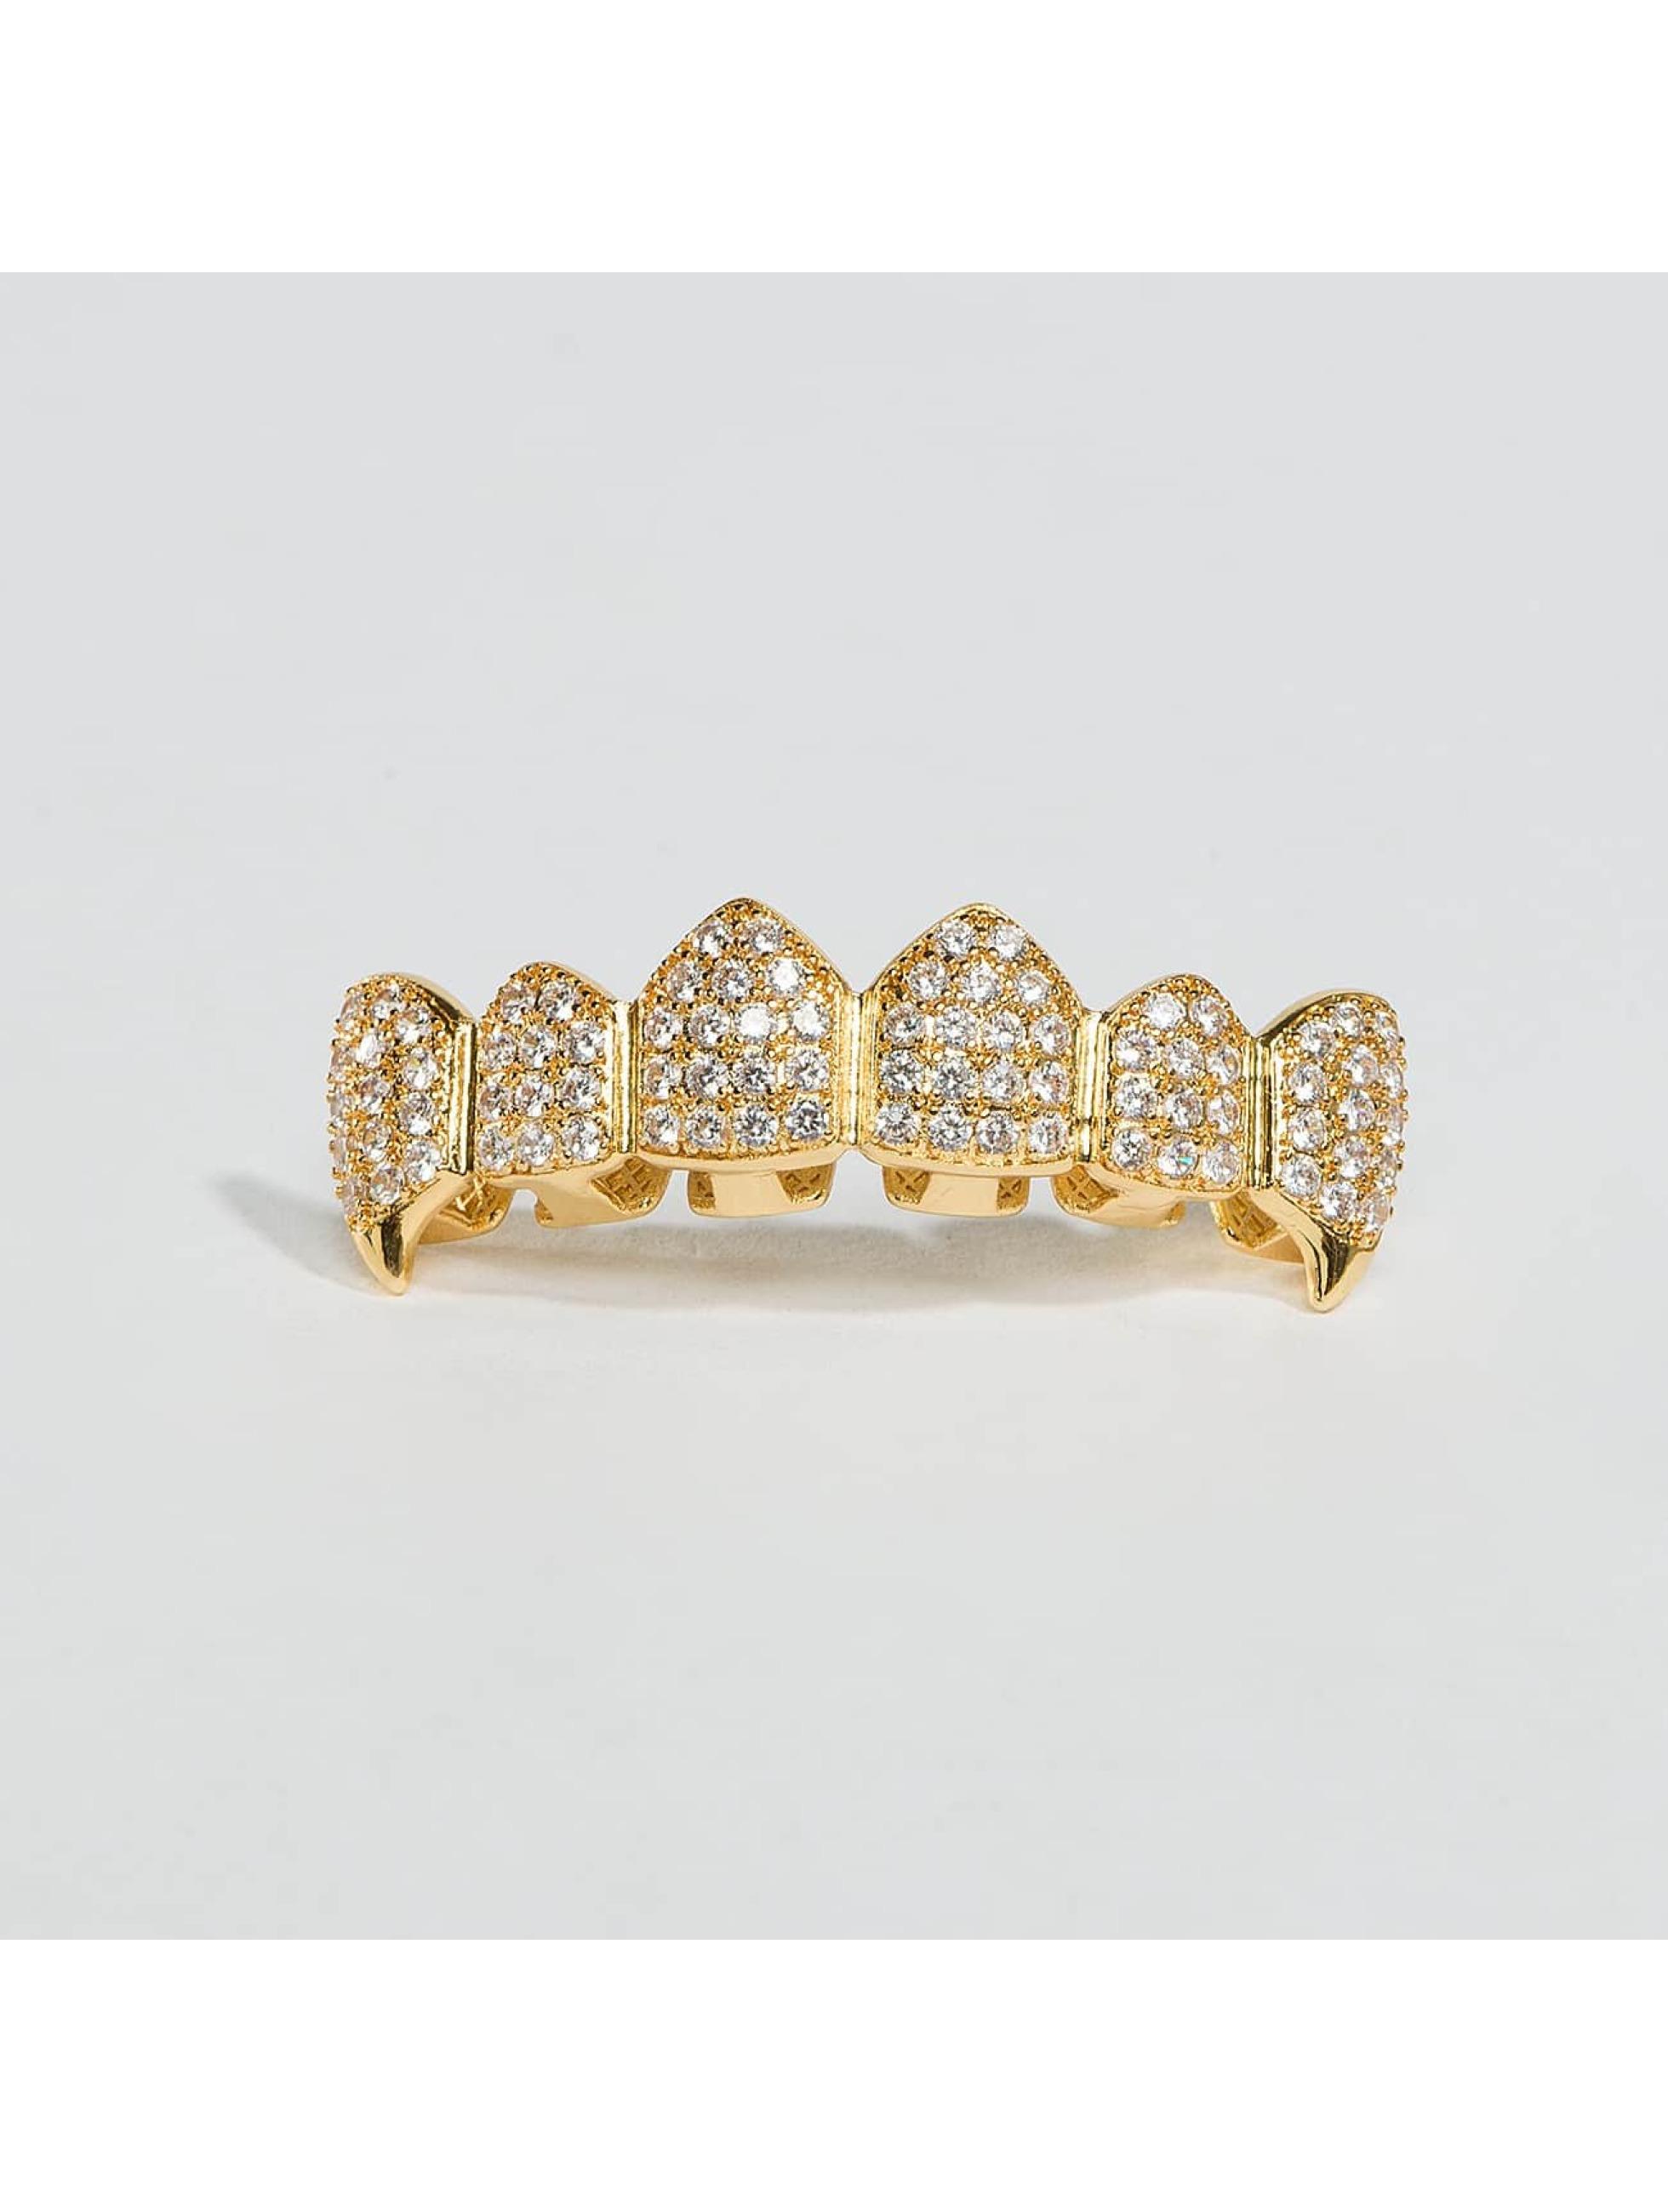 KING ICE Otro Gold_Plated CZ Dracula Teeth Top oro